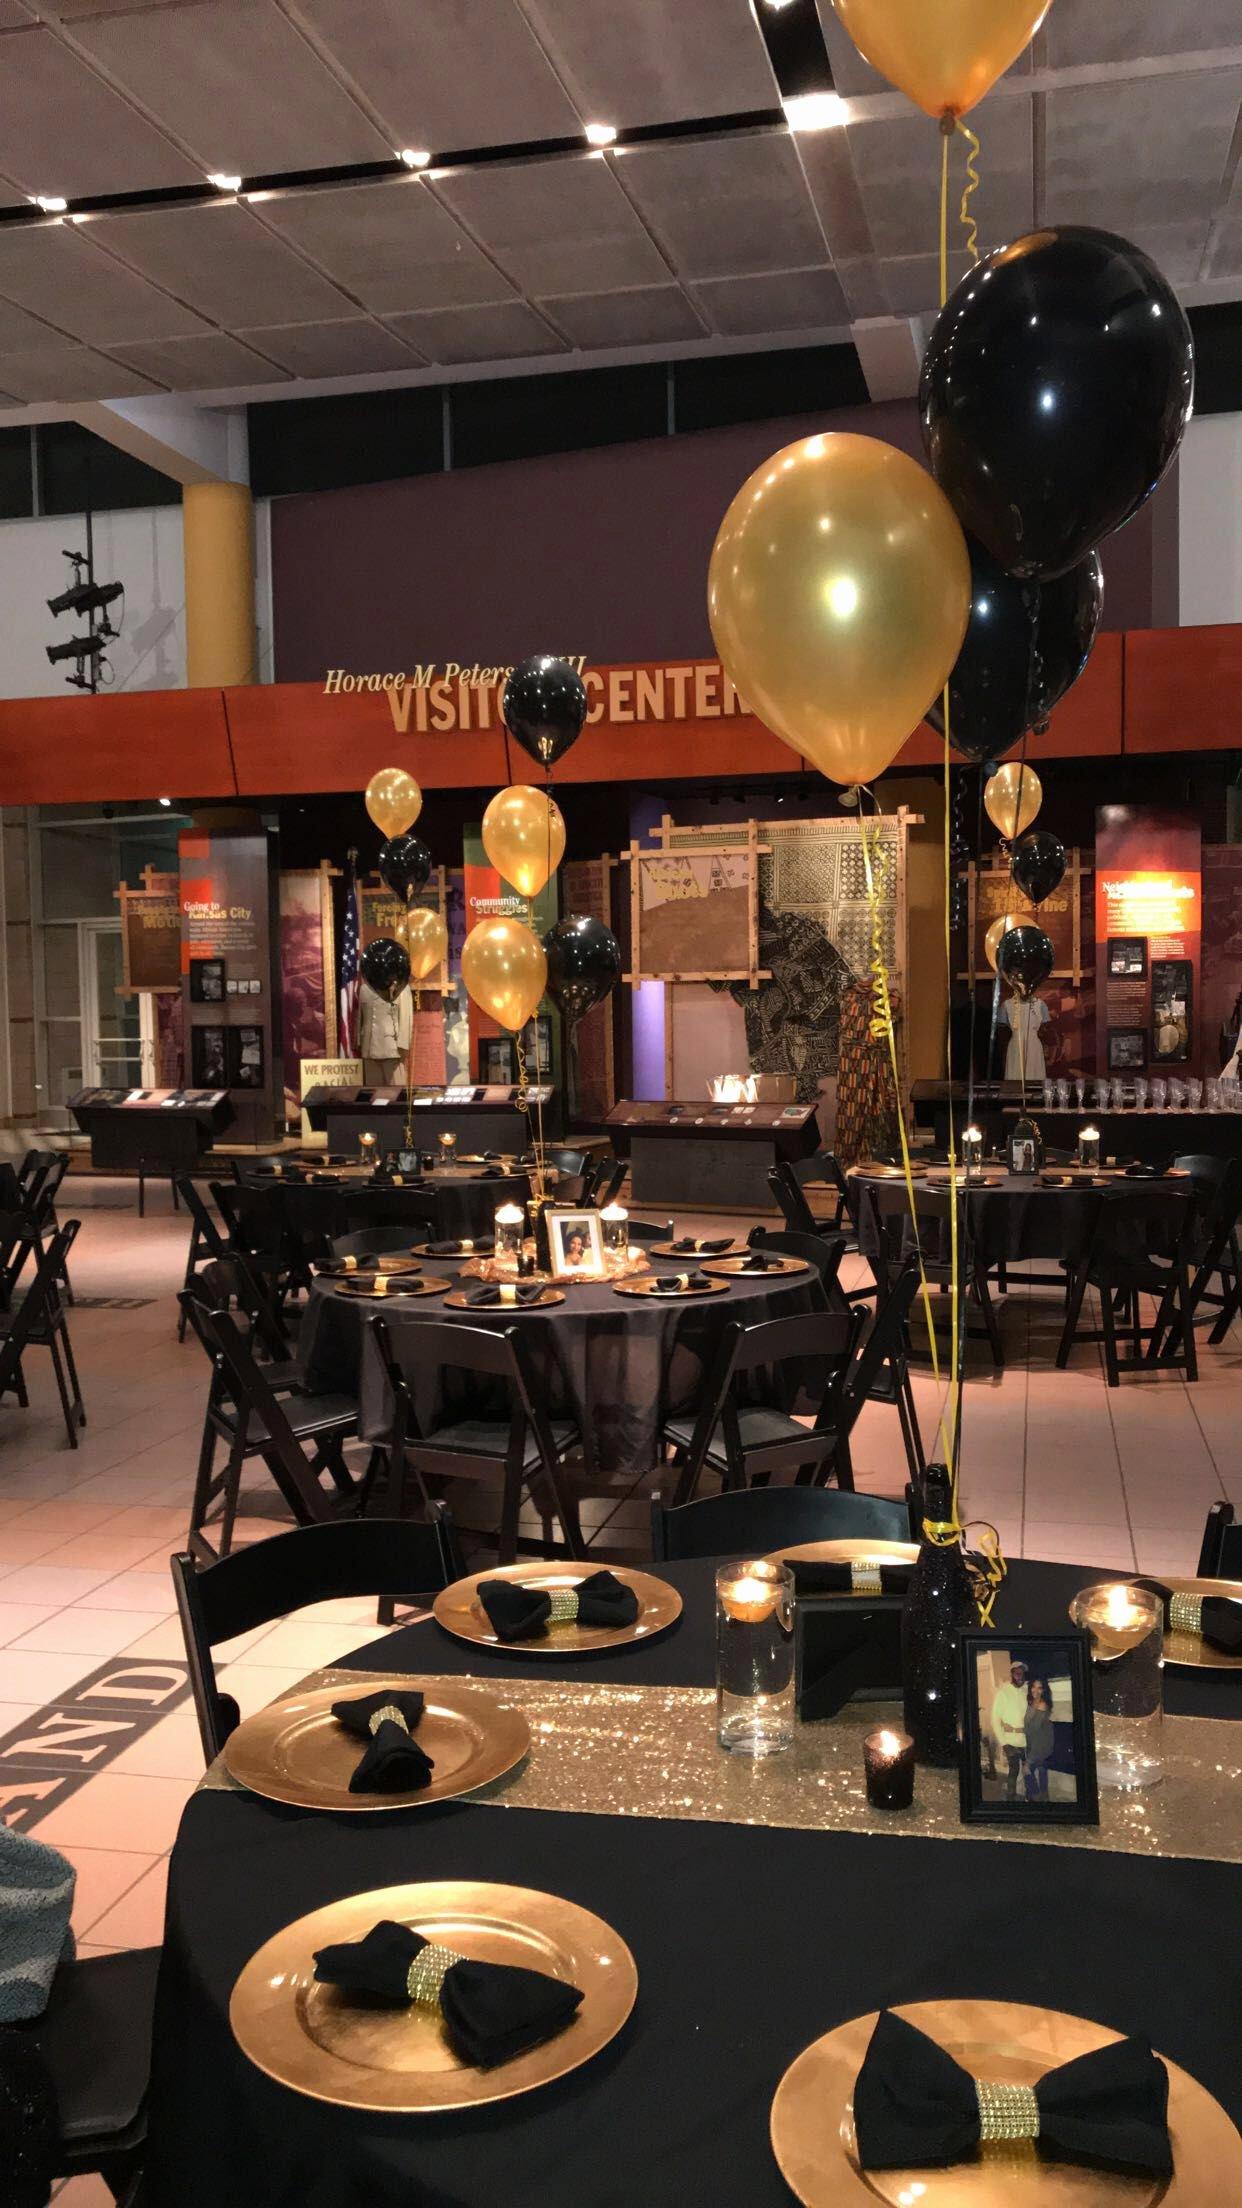 Restaurant Birthday Decoration Ideas Elegant Black and Gold Table Decor